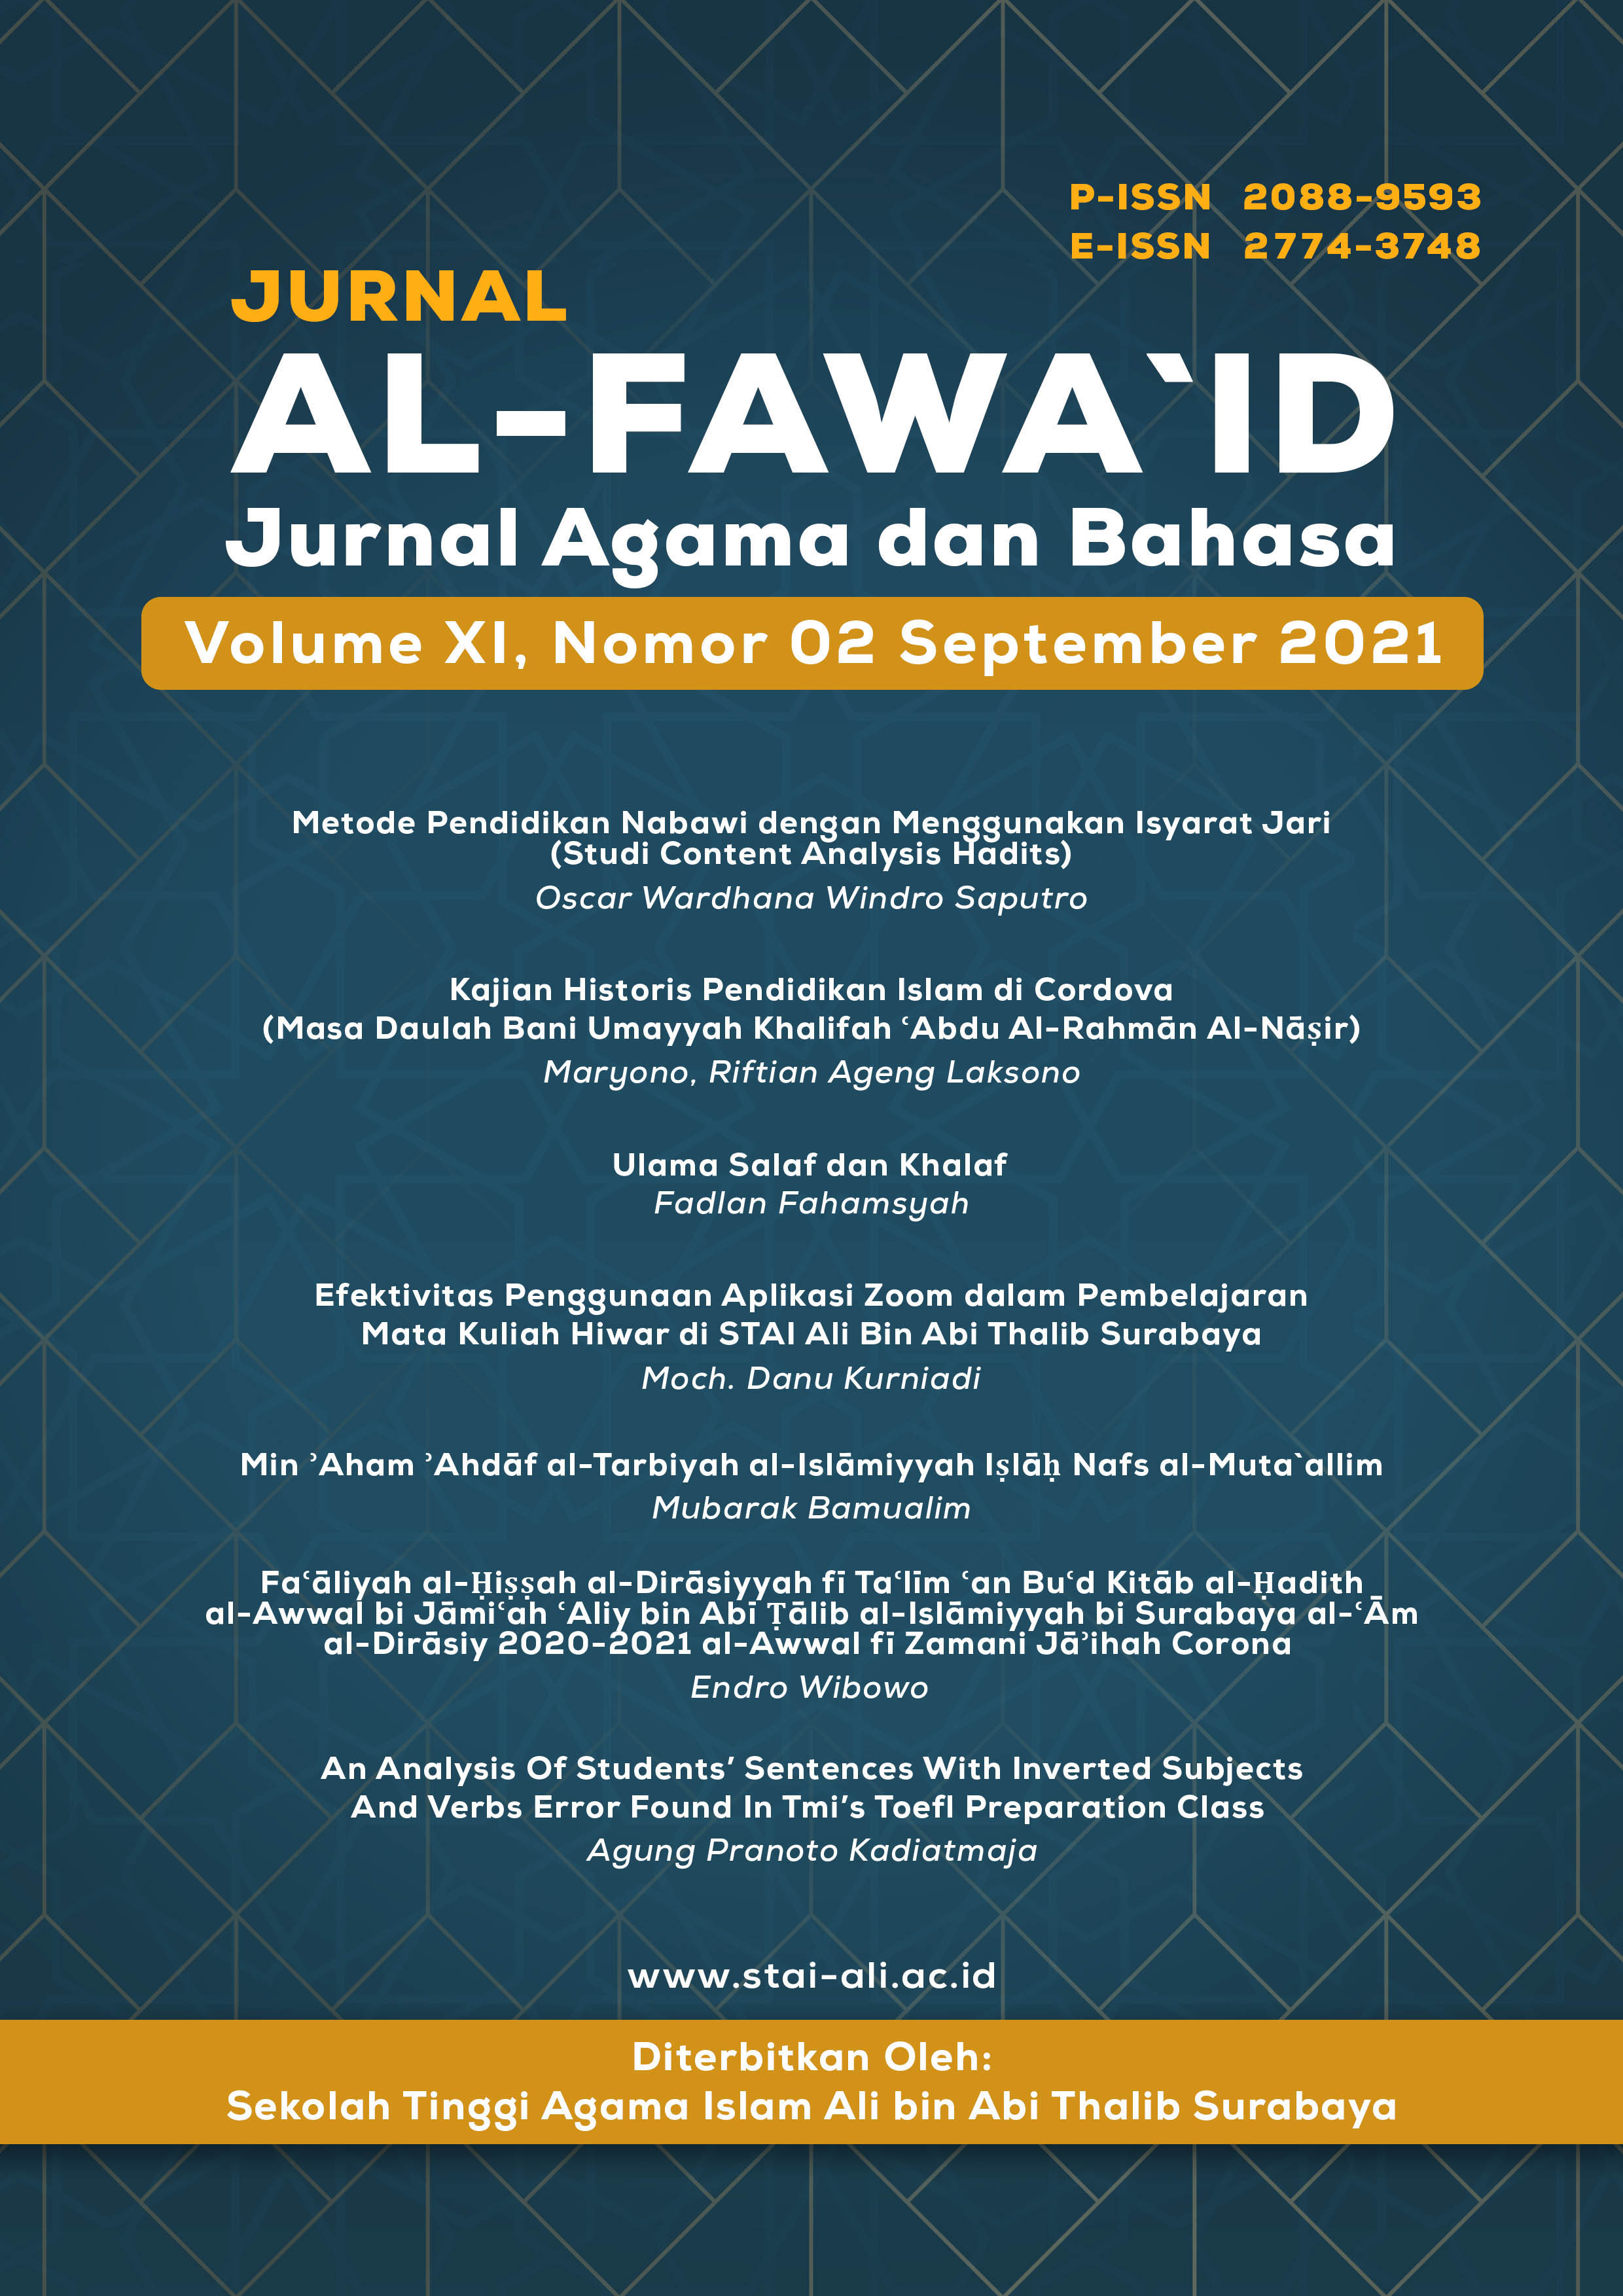 Jurnal Al-Fawa'id: Jurnal Agama dan Bahasa